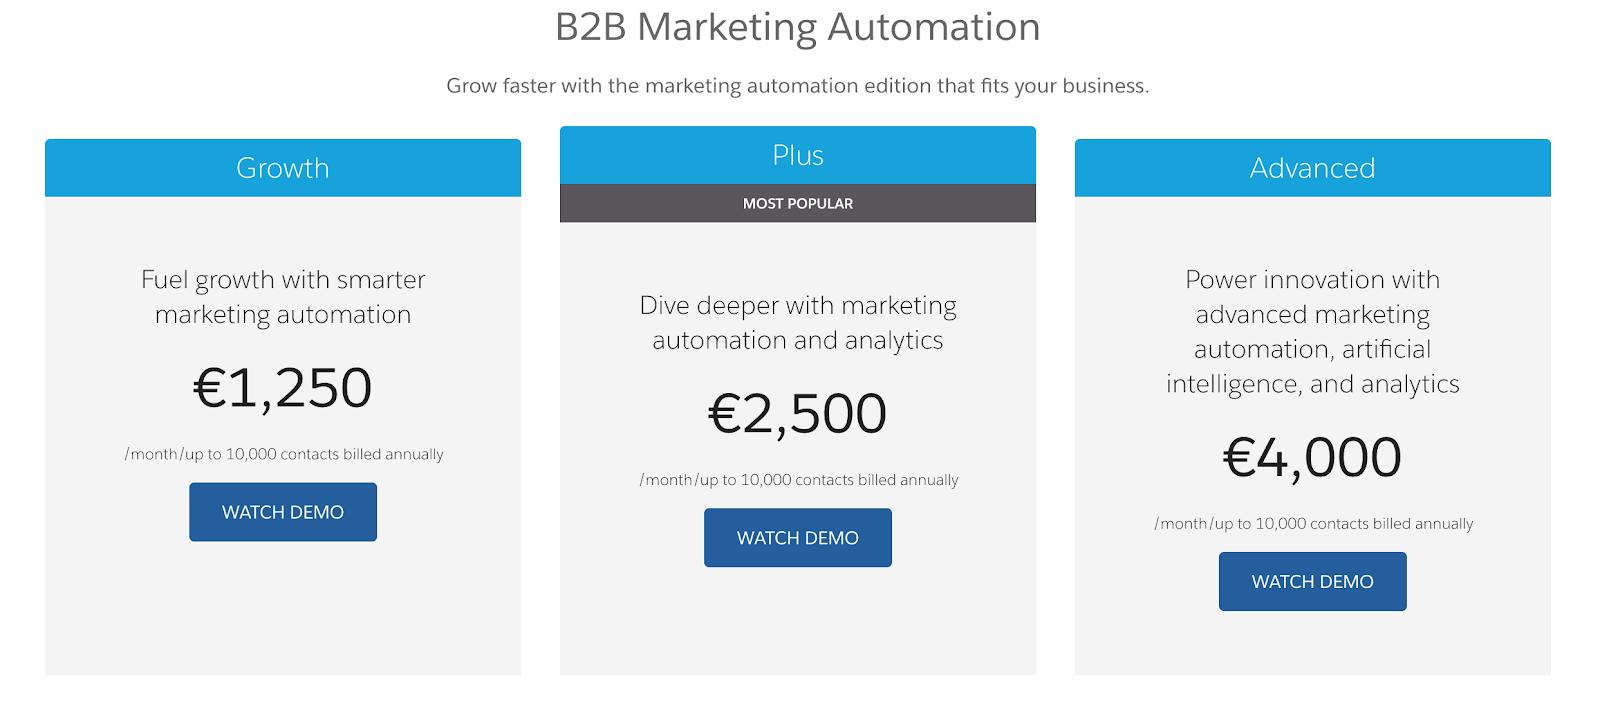 Pardot: Preise für B2B-Marketing-Automation